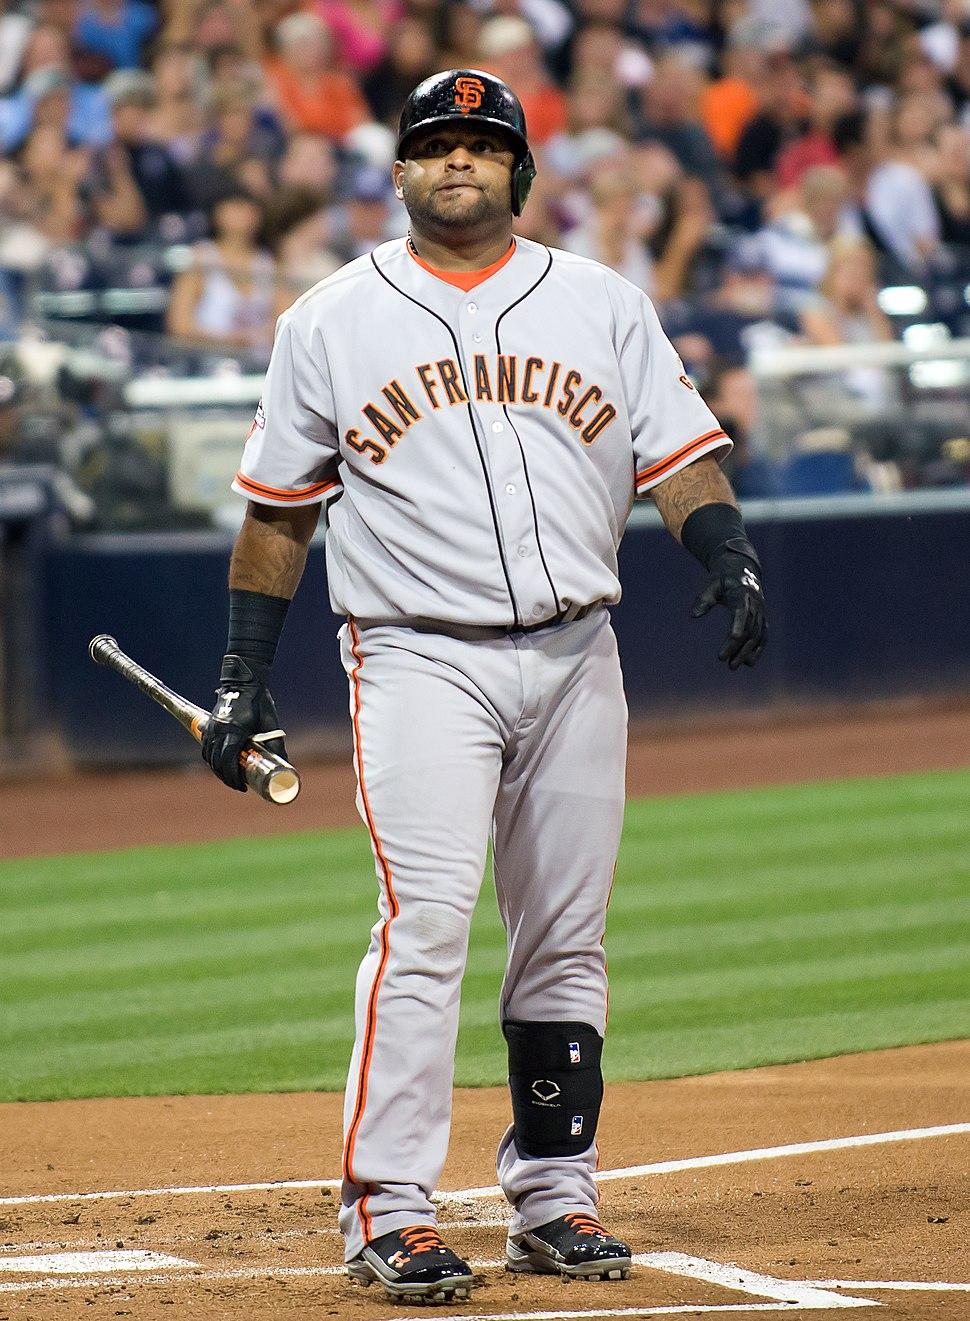 Pablo Sandoval on September 3, 2013